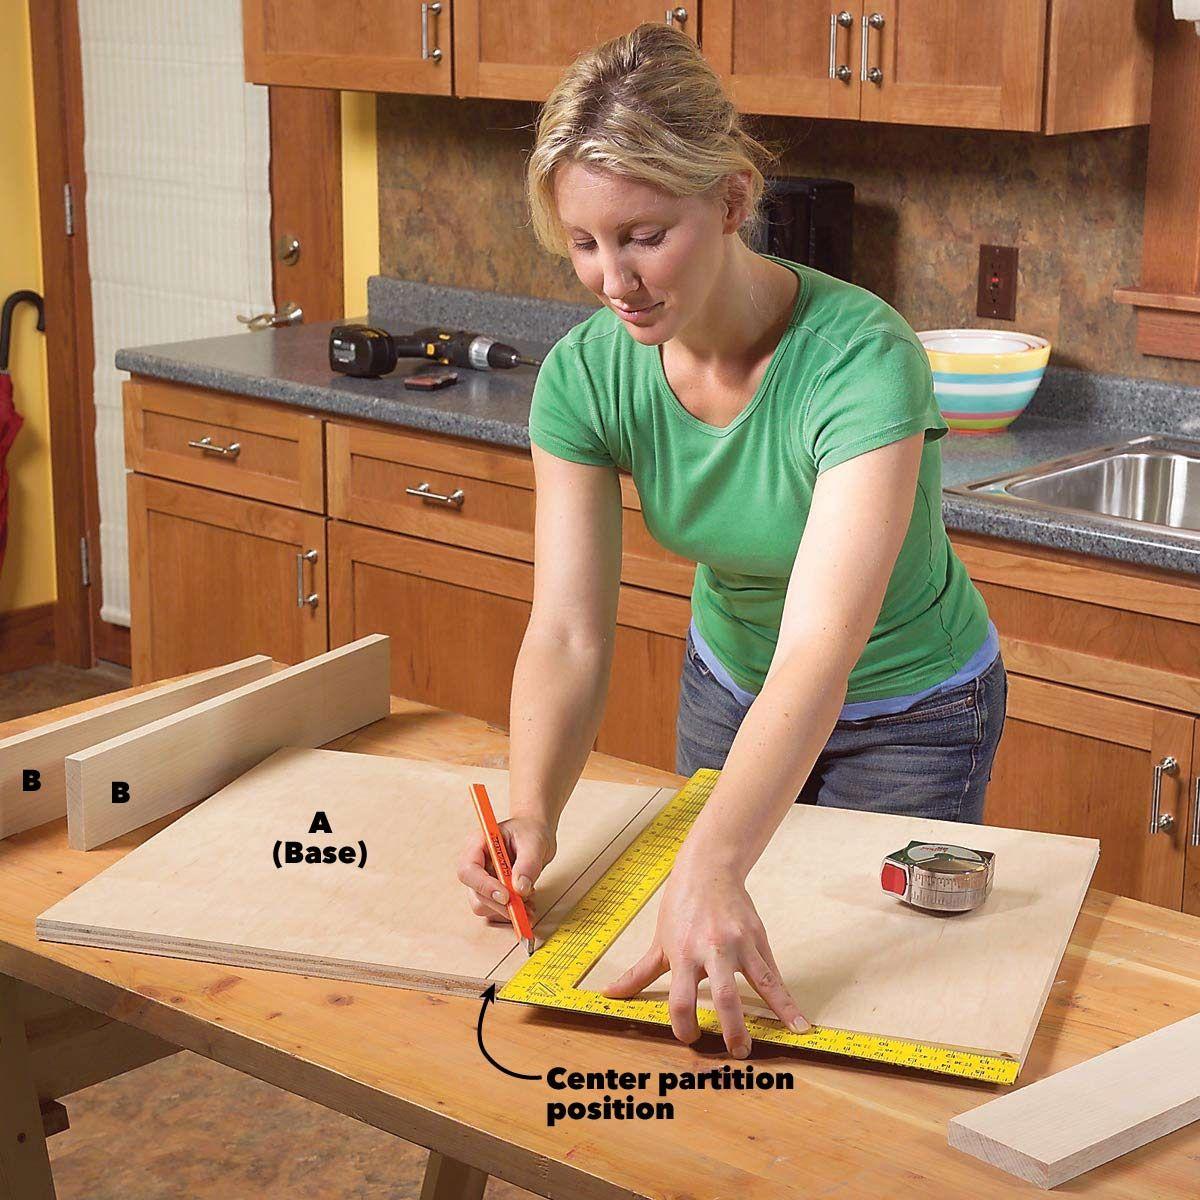 How To Build Kitchen Sink Storage Trays Kitchen Sink Storage Kitchen Cabinet Storage Under Sink Storage